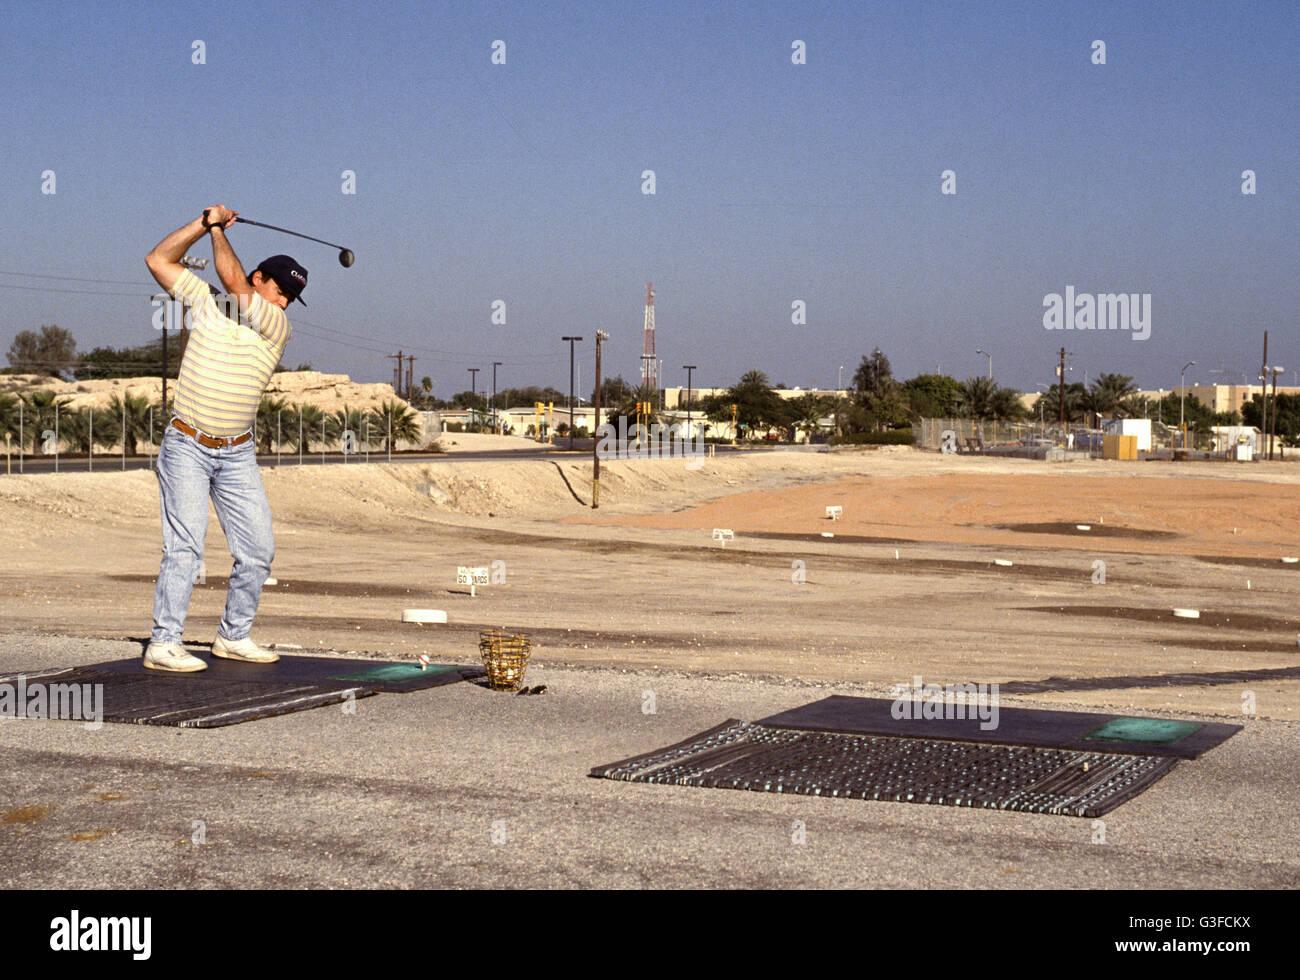 dhahran, saudi arabia - the golf practicing range at the sprawling